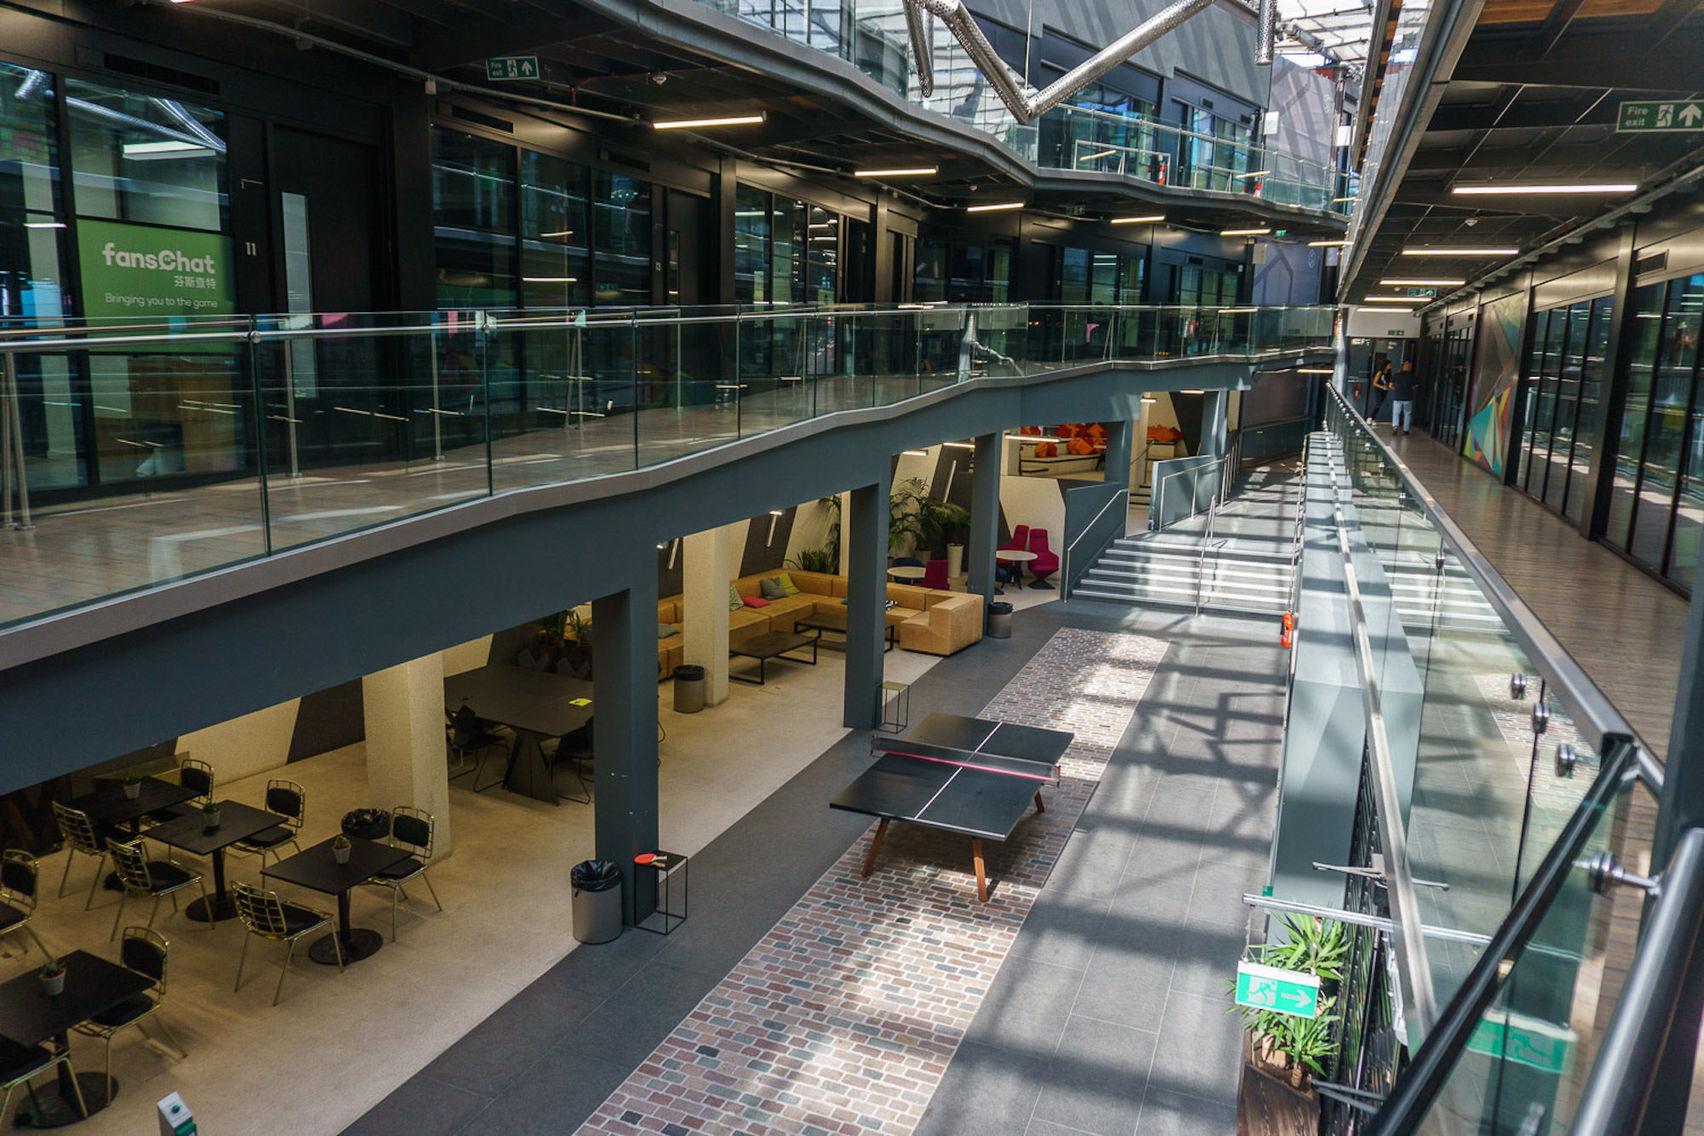 Private event space, Interchange Atrium Arches